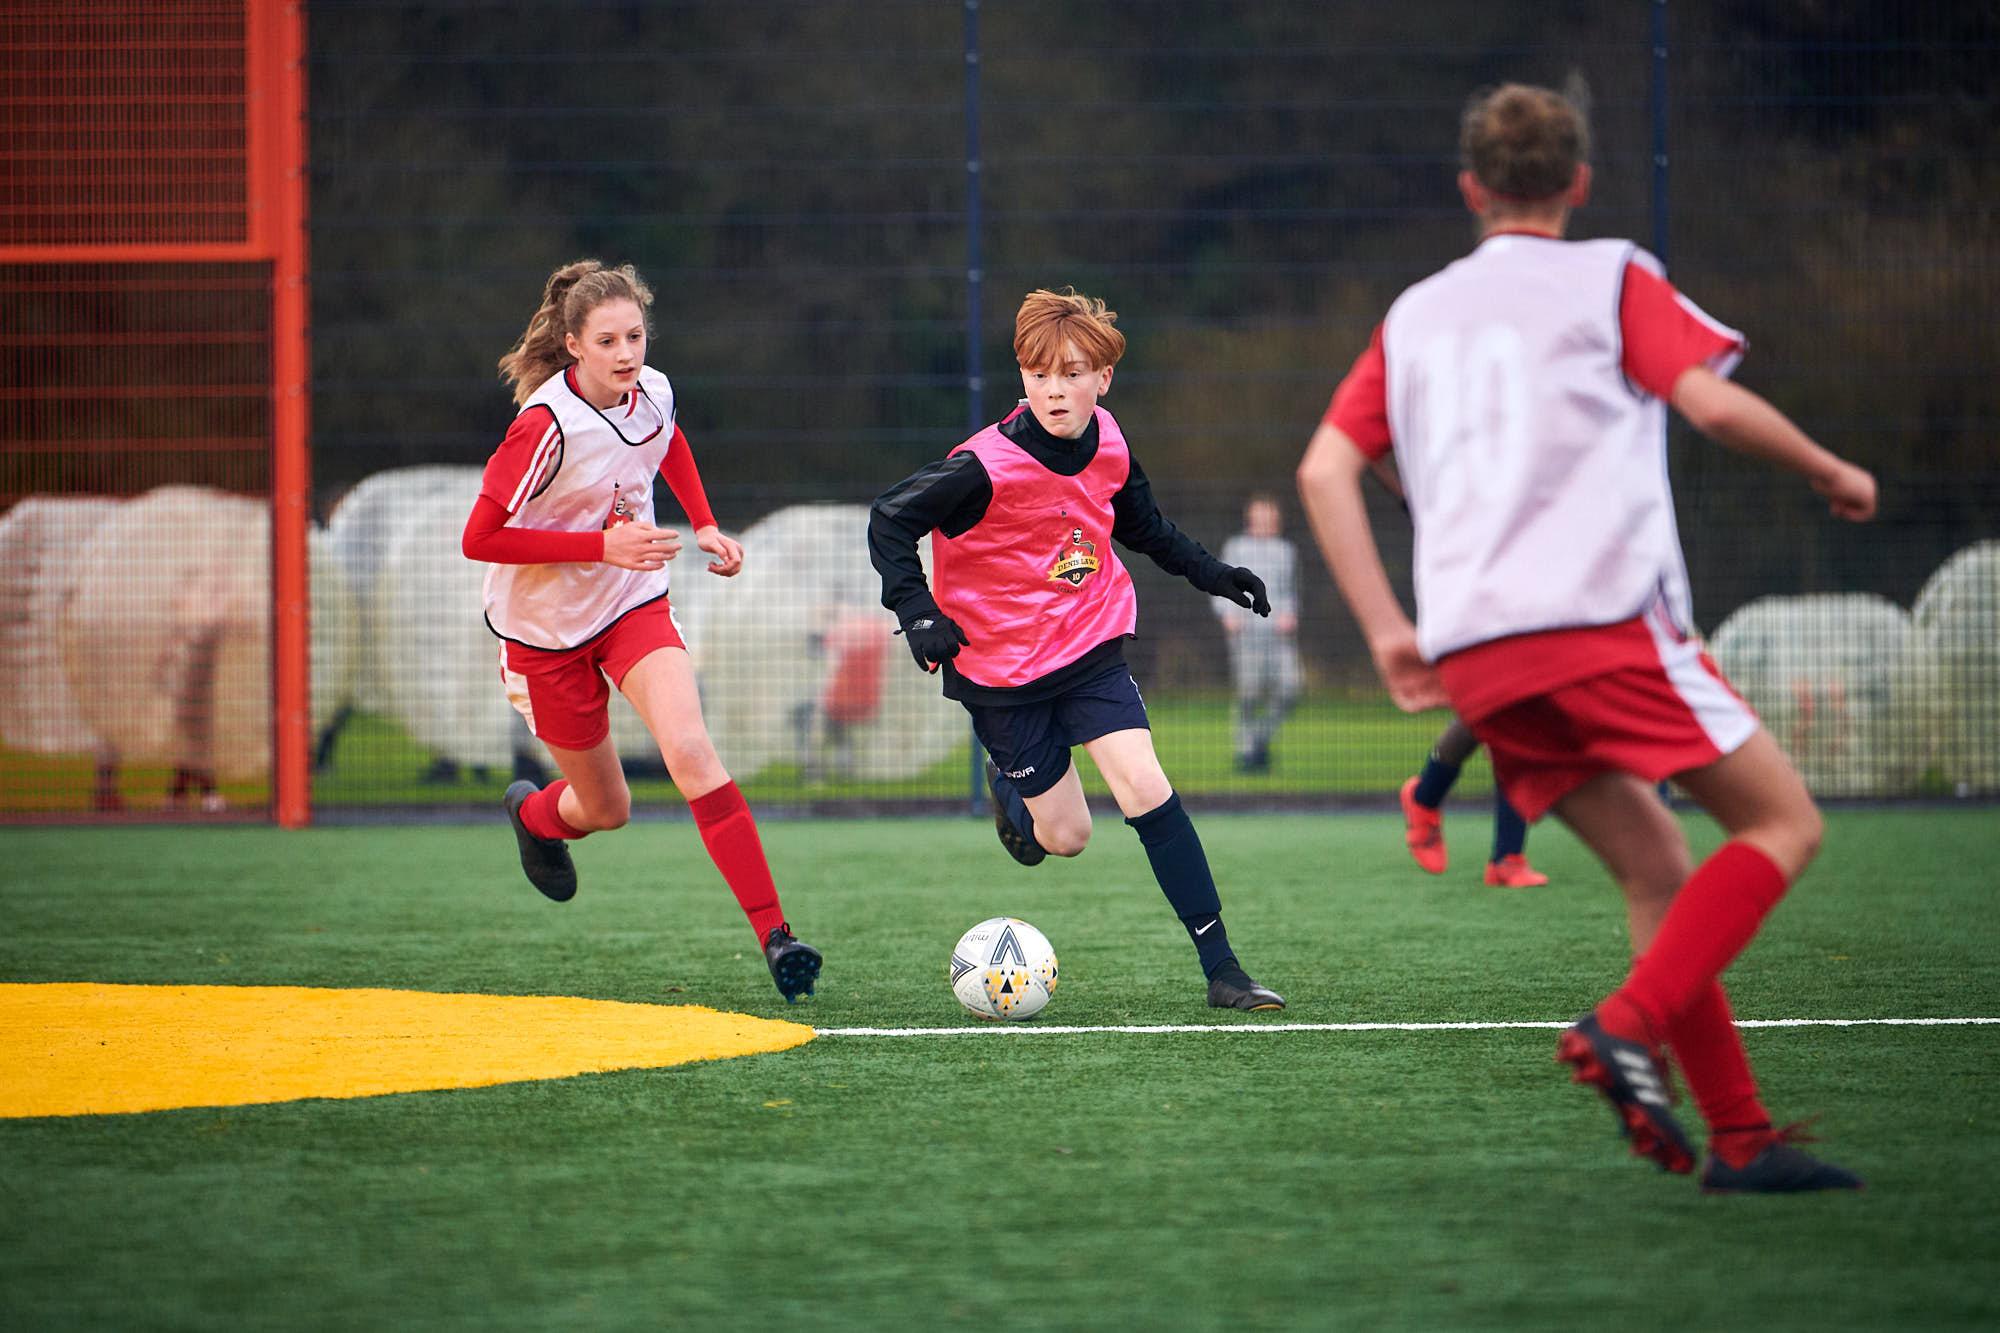 Kids playing football on a Cruyff Court in Aberdeen, Scotland